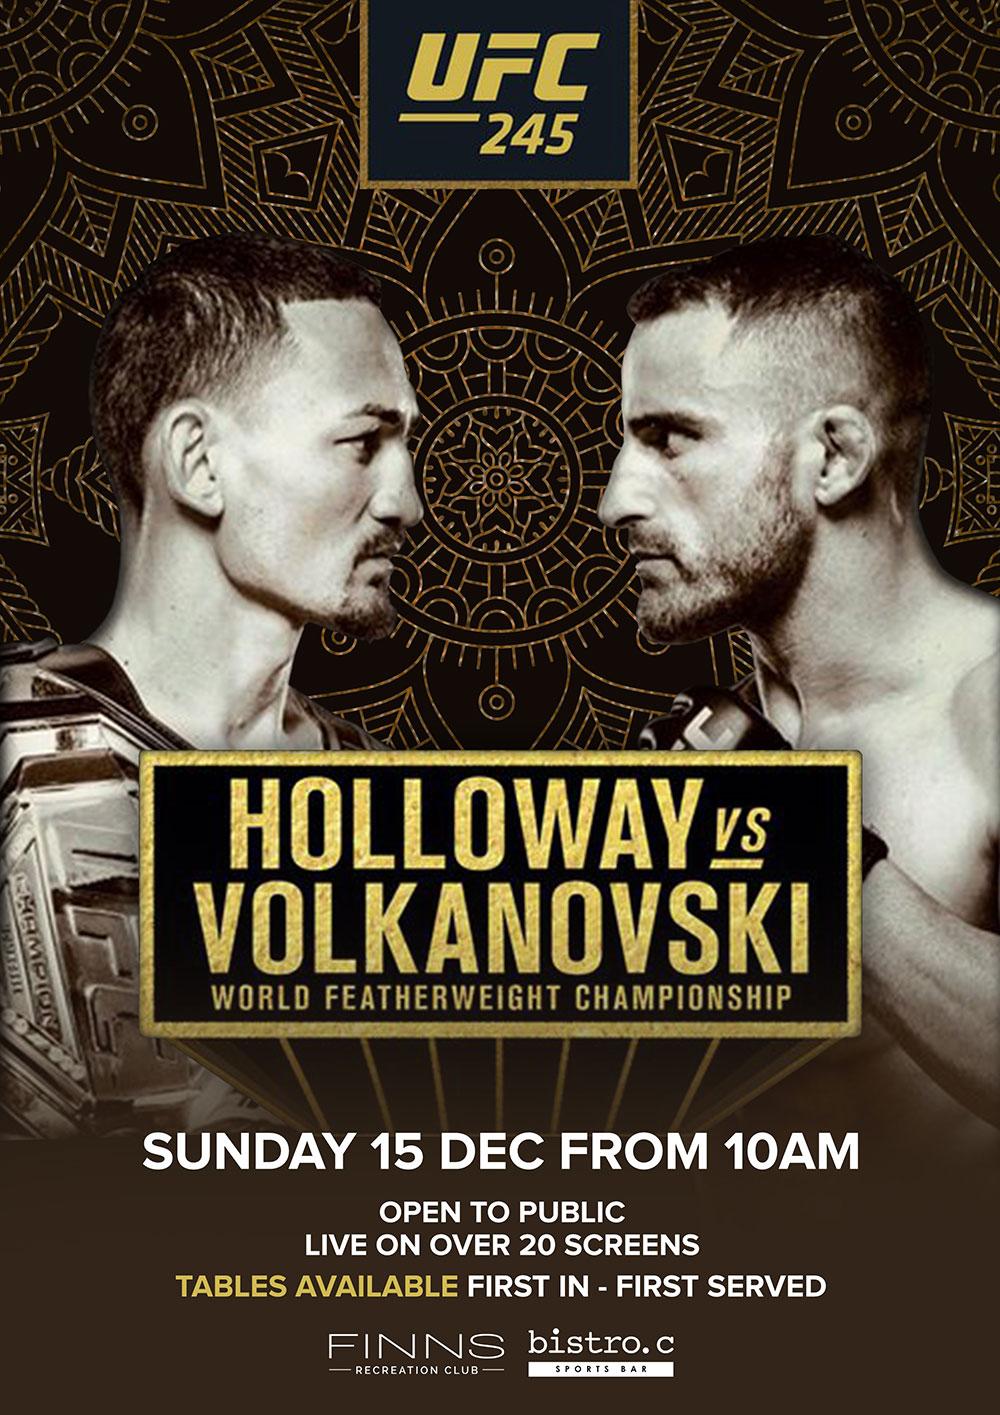 UFC 245 Holloway vs Volkanovski